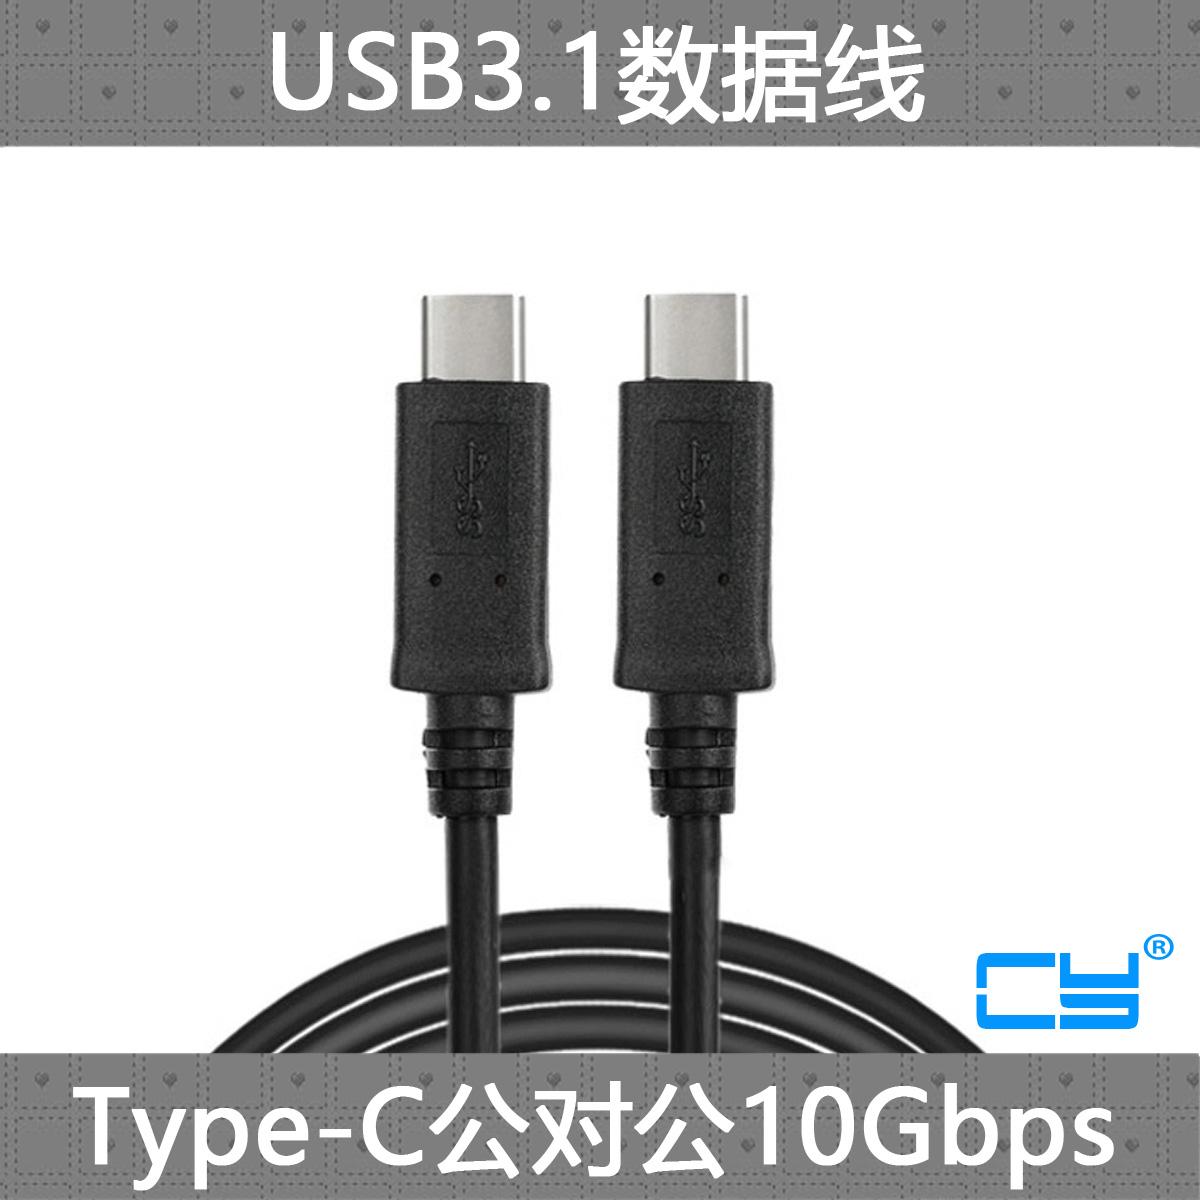 CY辰陽USB-C雙頭USB 3.1 Type C資料線 USB-C公對公Macbook硬碟線